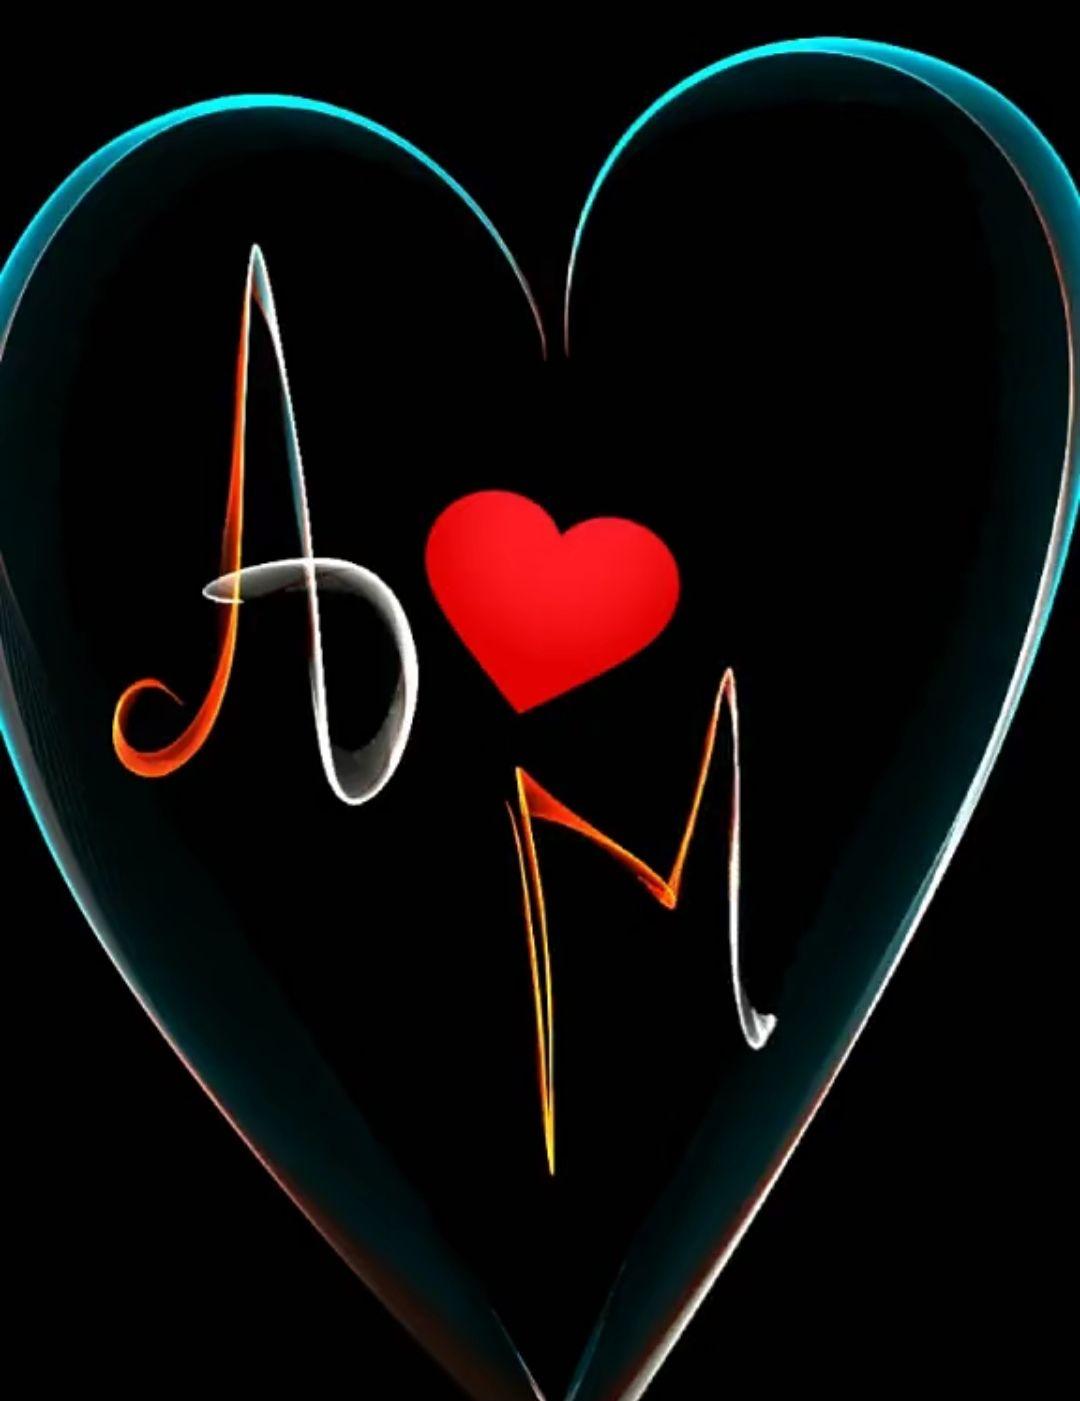 A Or M Name Wale Love Status Graffiti Lettering Fonts Graffiti Lettering A Letter Wallpaper A name wallpaper love images